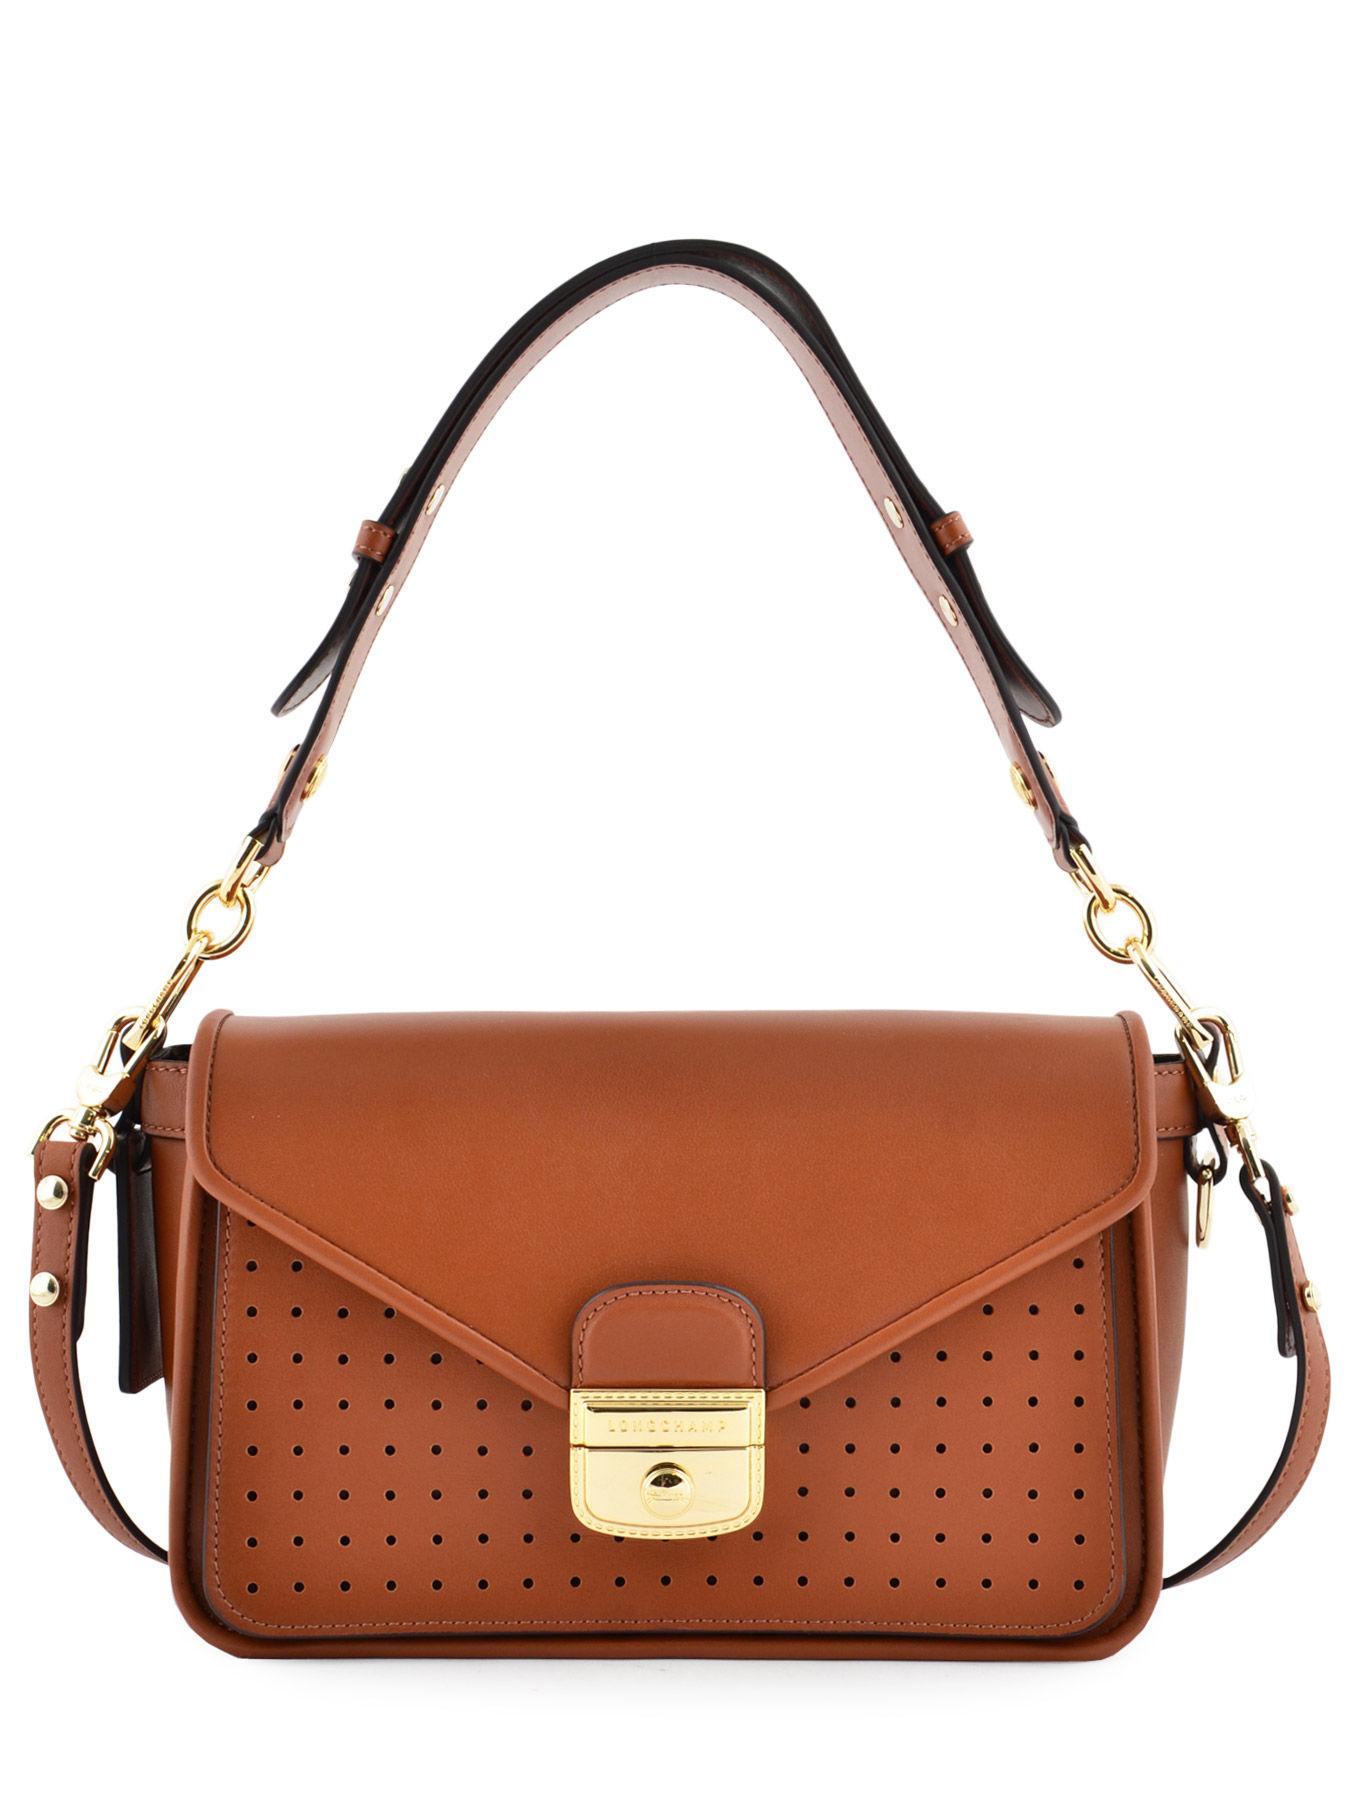 S Shoulder bag Mademoiselle longchamp leather LONGCHAMP